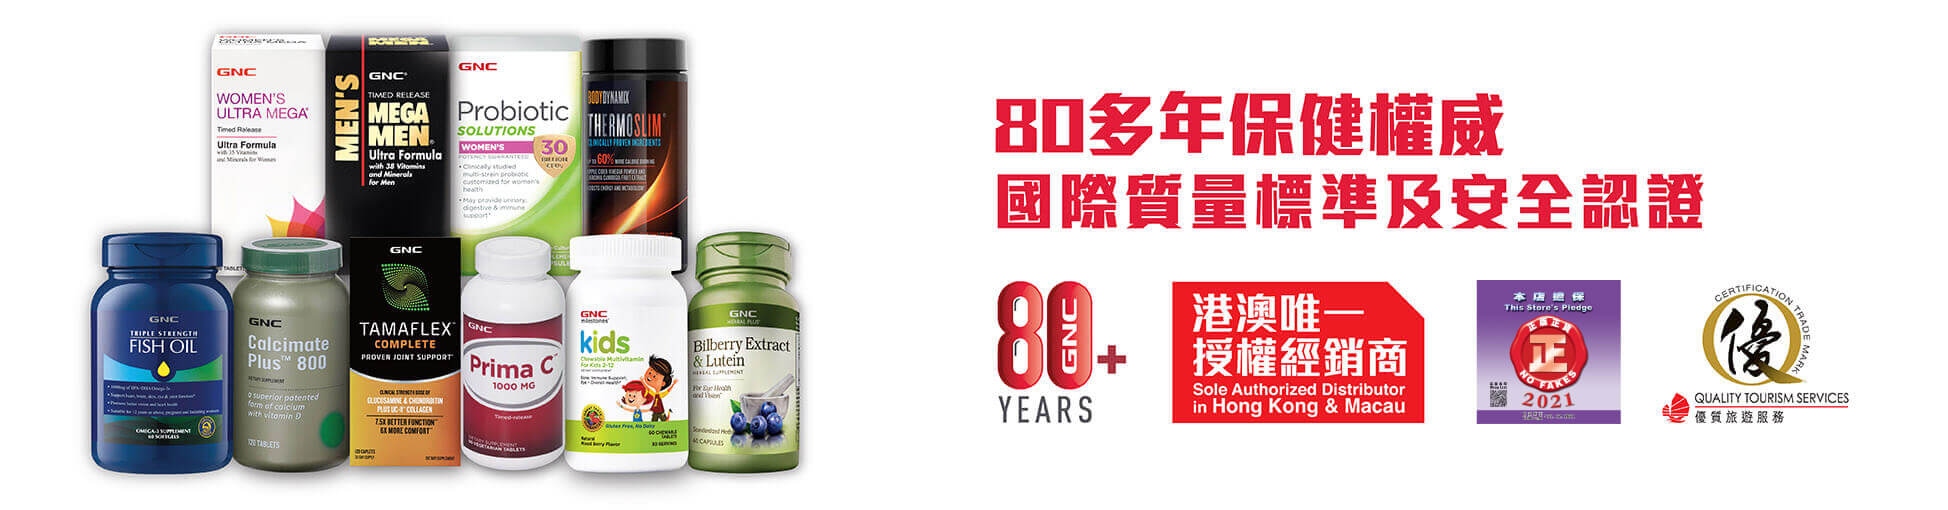 gnc-80yrs-of-recognition_web-banner_v01_2021plus-banner-hk